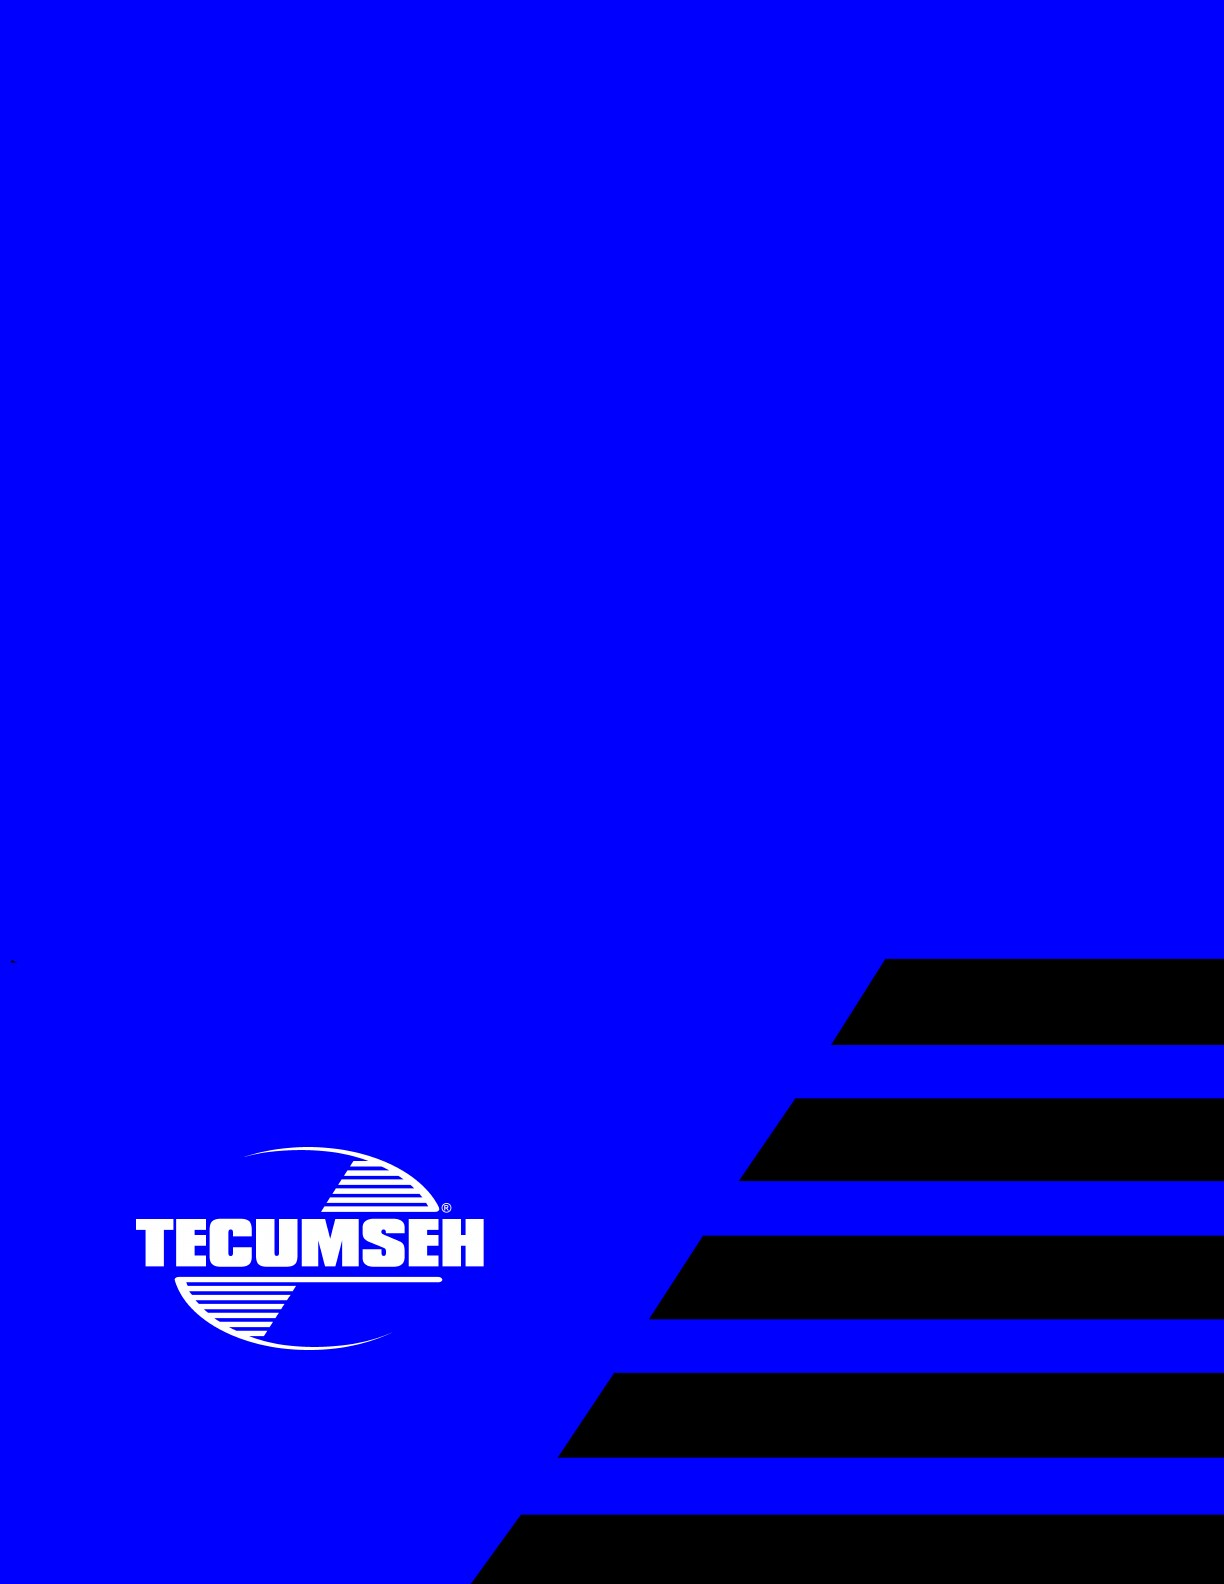 Tecumseh 6 5 Hp Engine Diagram 2 1 Tesmm Tecumseh Engine Service Maintenance Manual [pdf Document] Of Tecumseh 6 5 Hp Engine Diagram 2